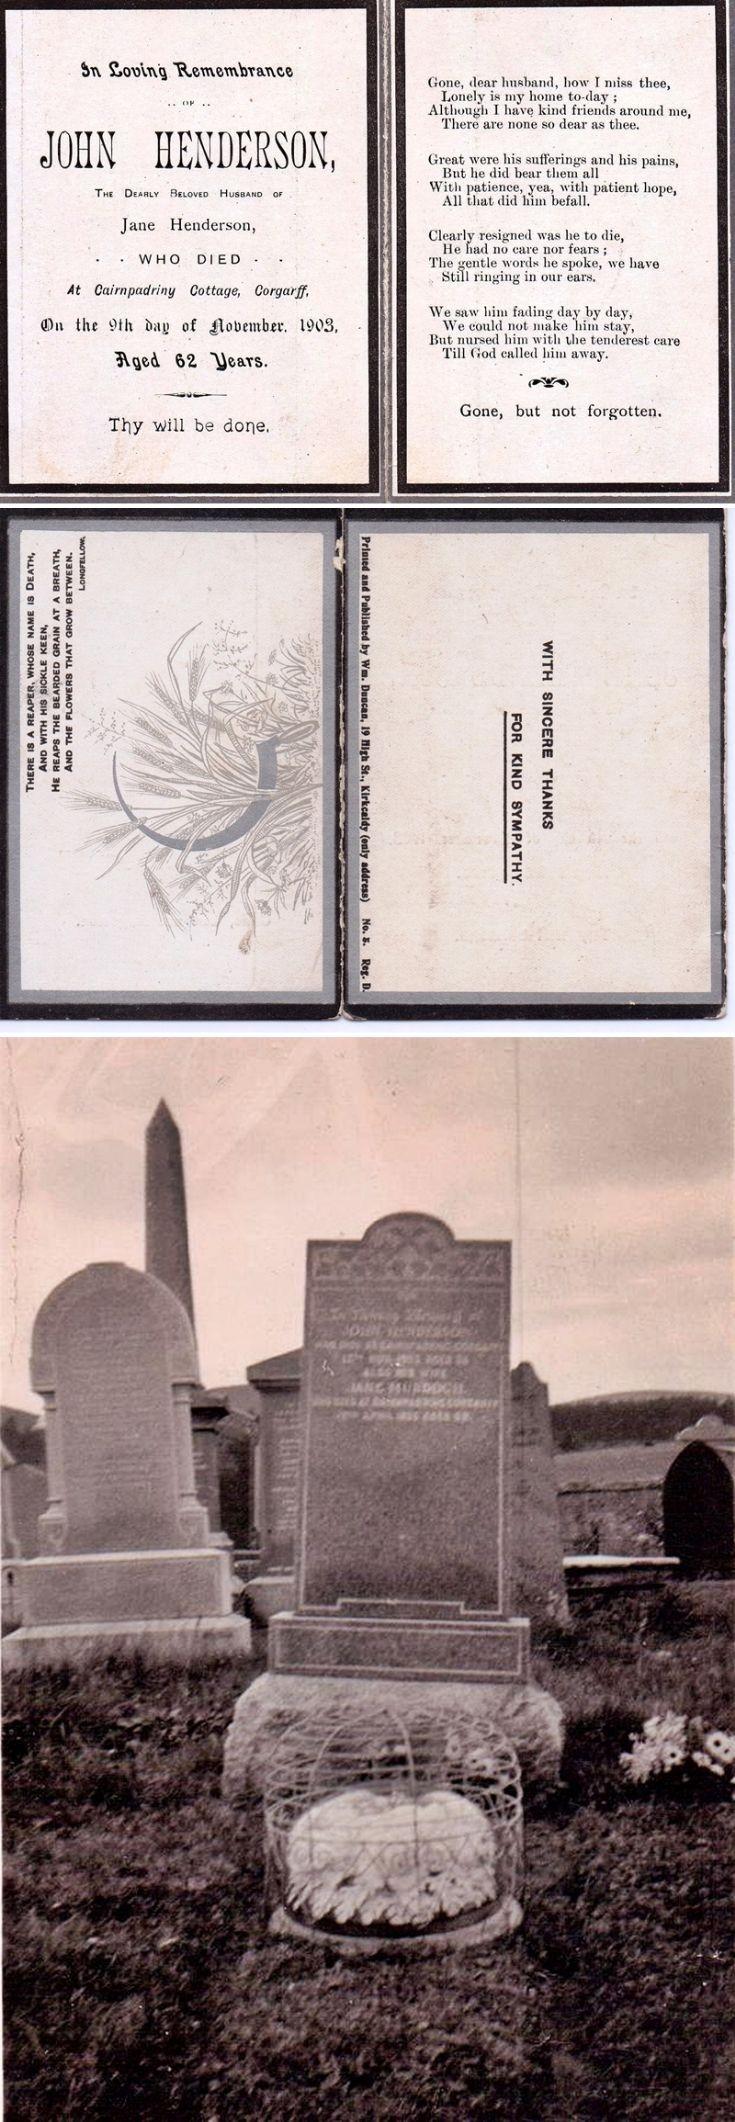 8  John Henderson Funeral Card